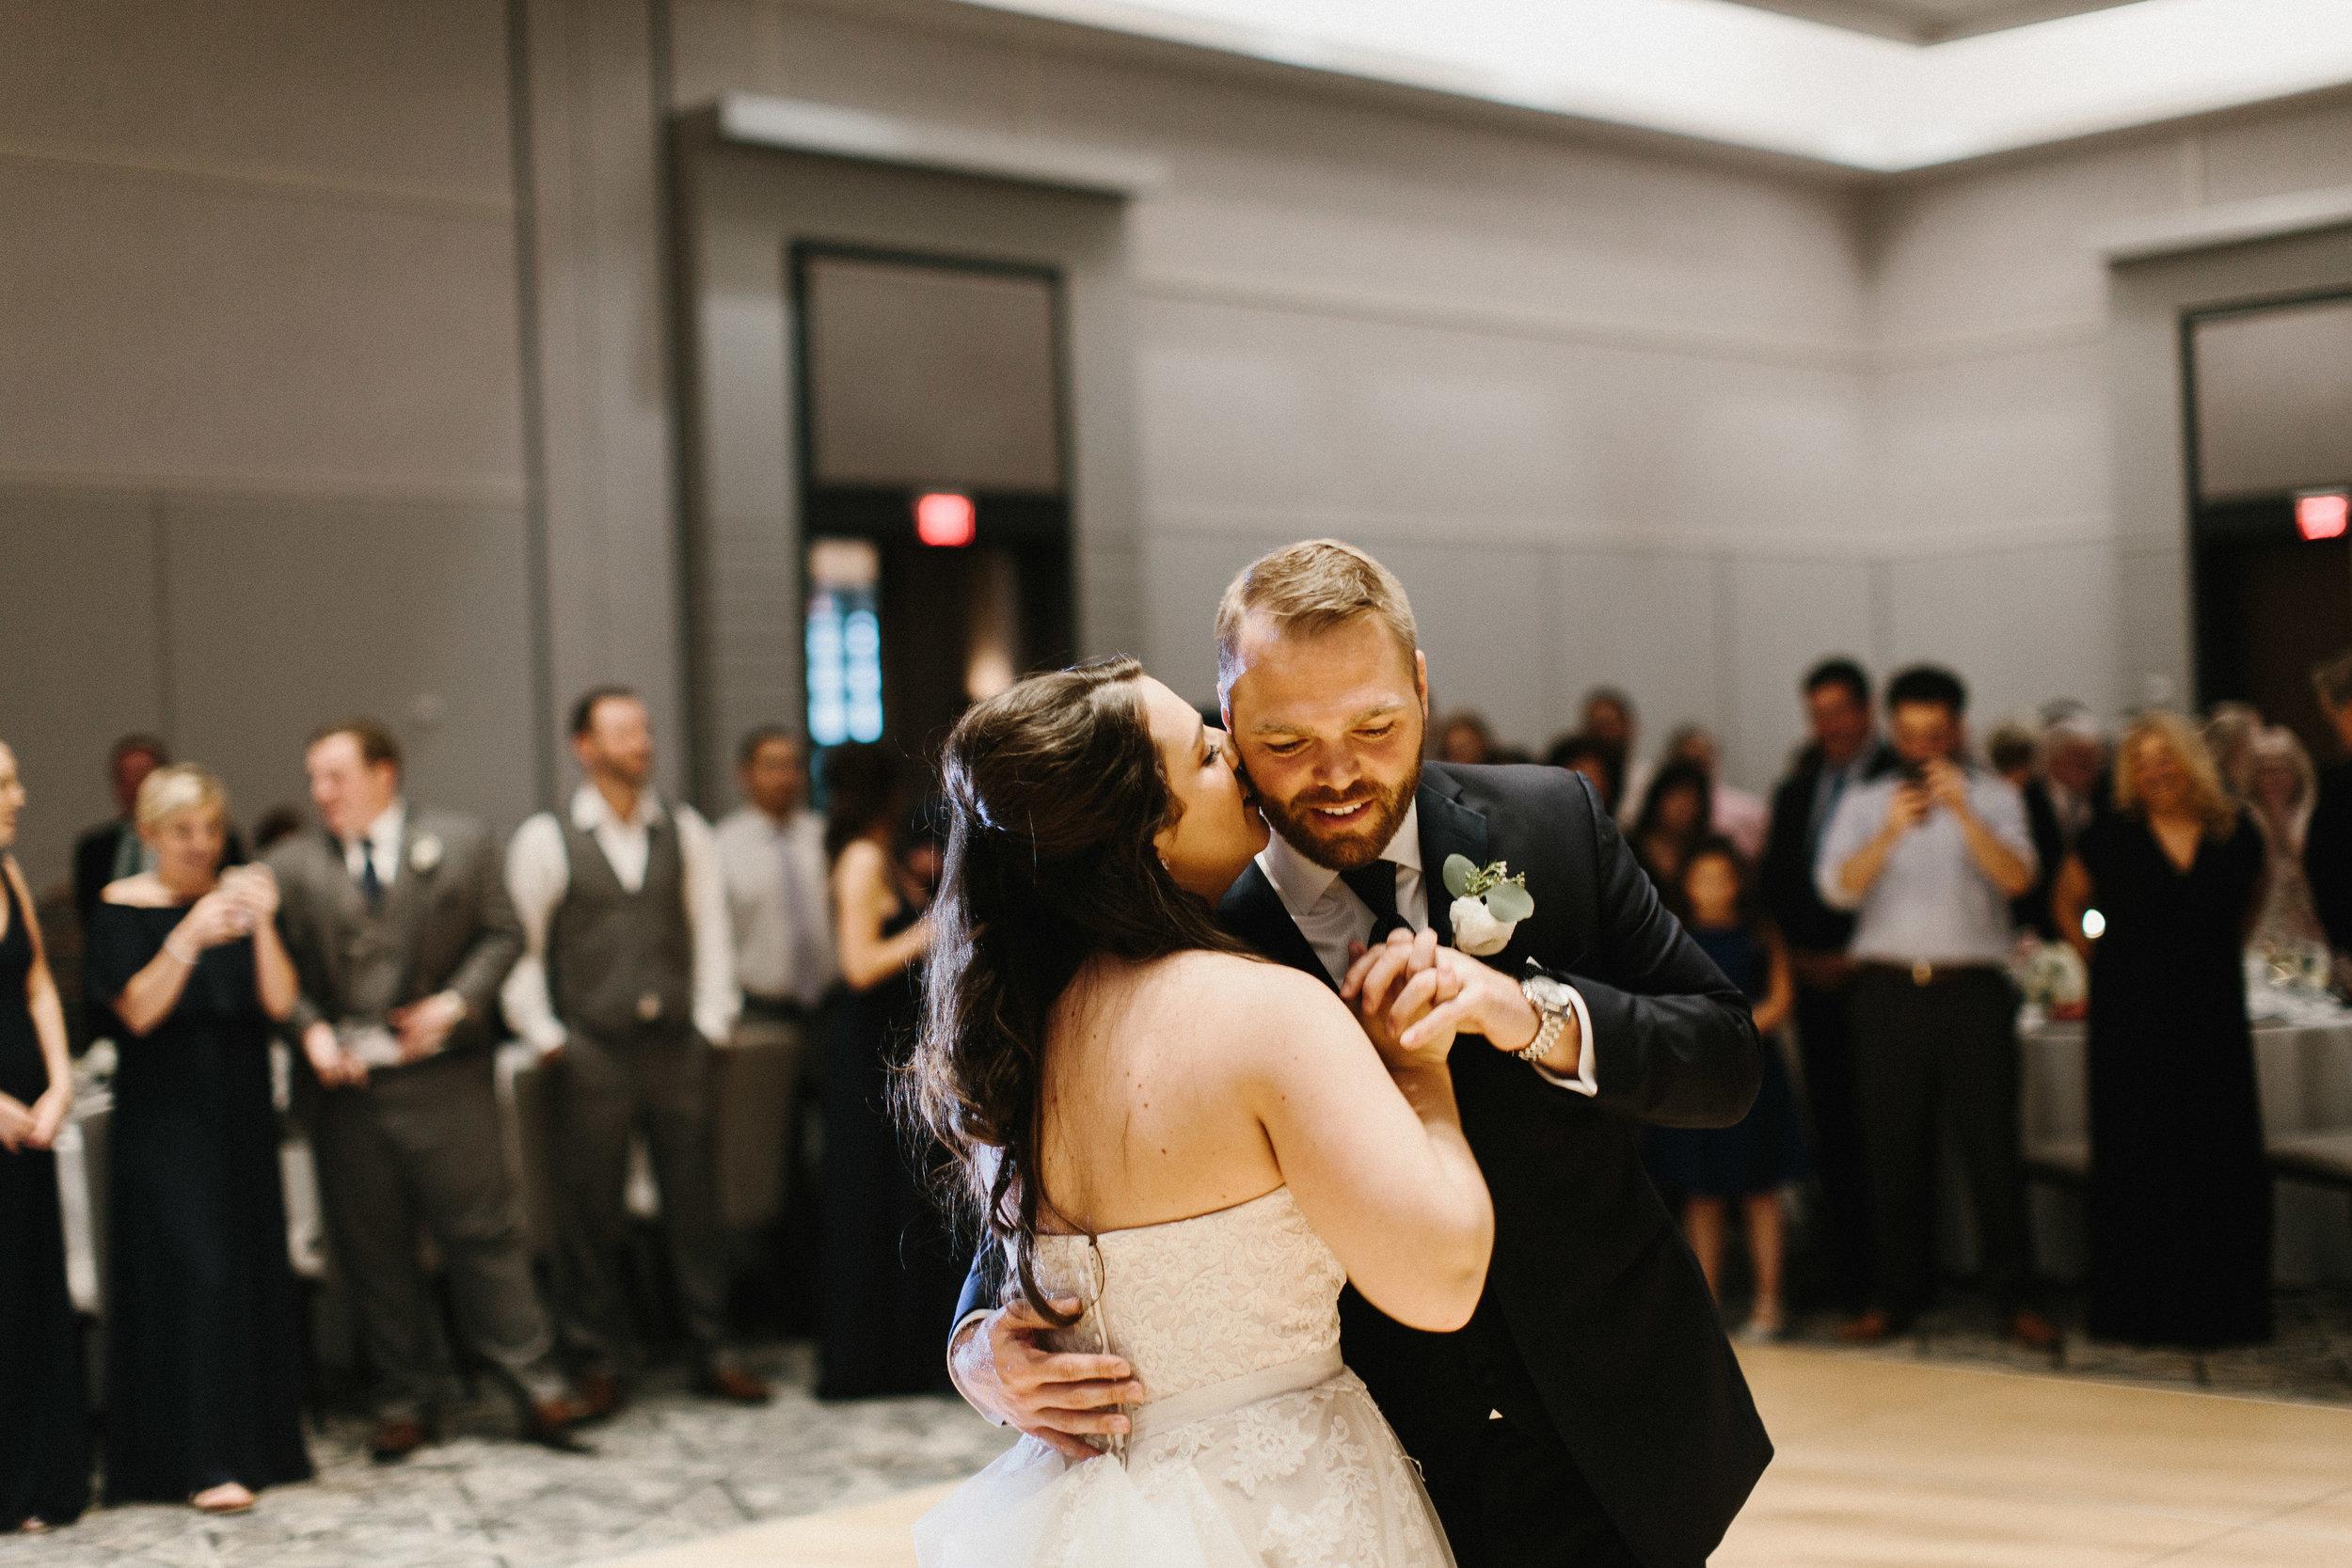 roswell_st_peter_chanel_catholic_avalon_hotel_alpharetta_wedding-2019.jpg